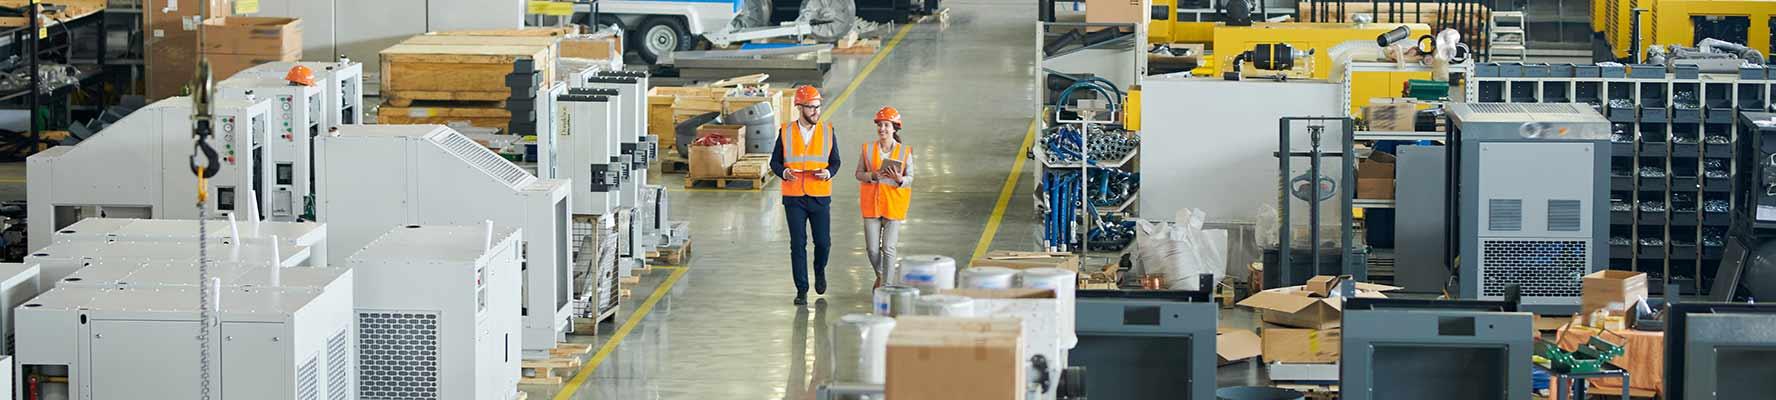 factory floor with two workers walking down corridor